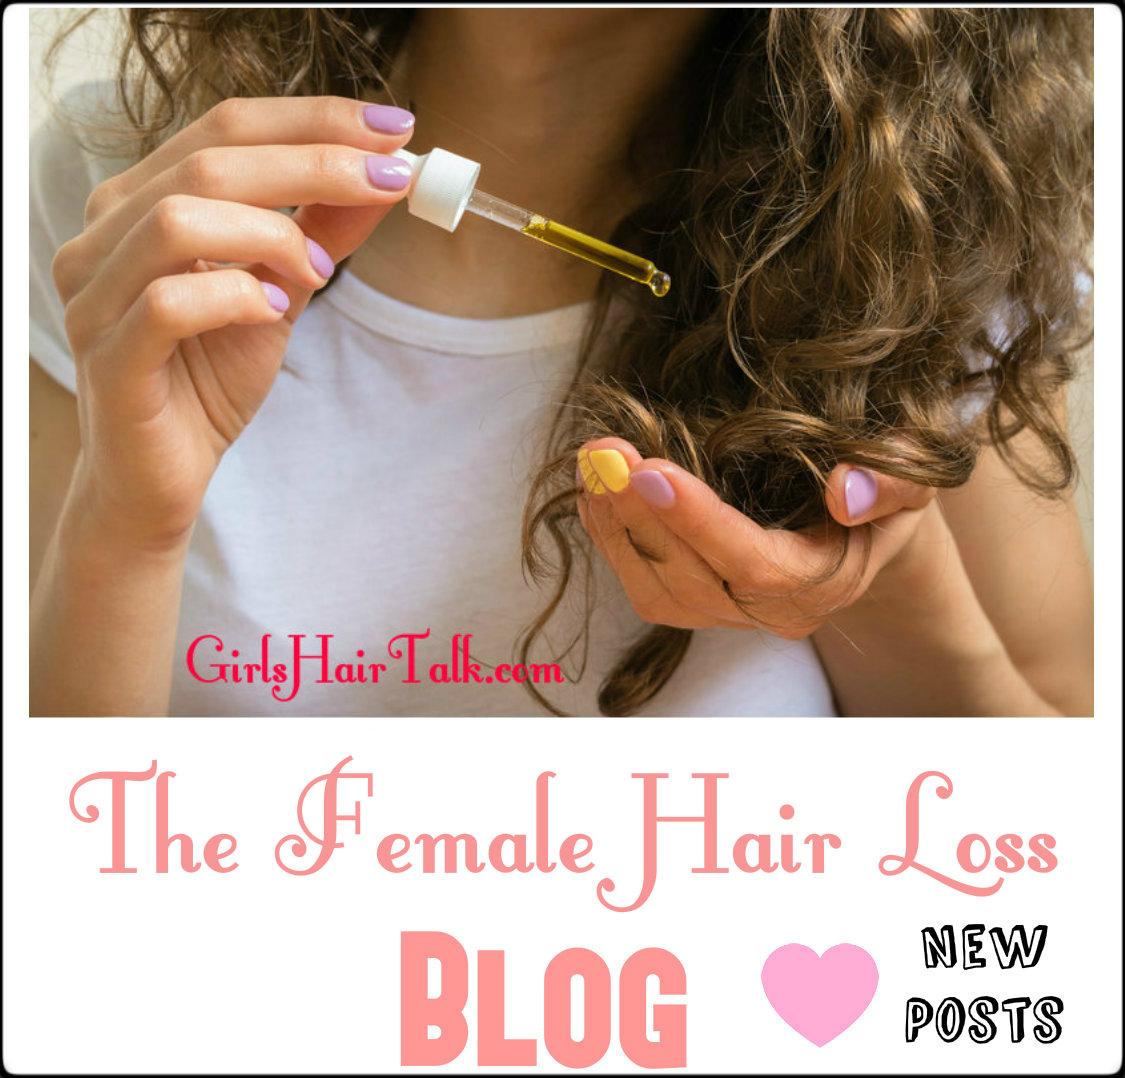 Women putting on hair treatment serum.